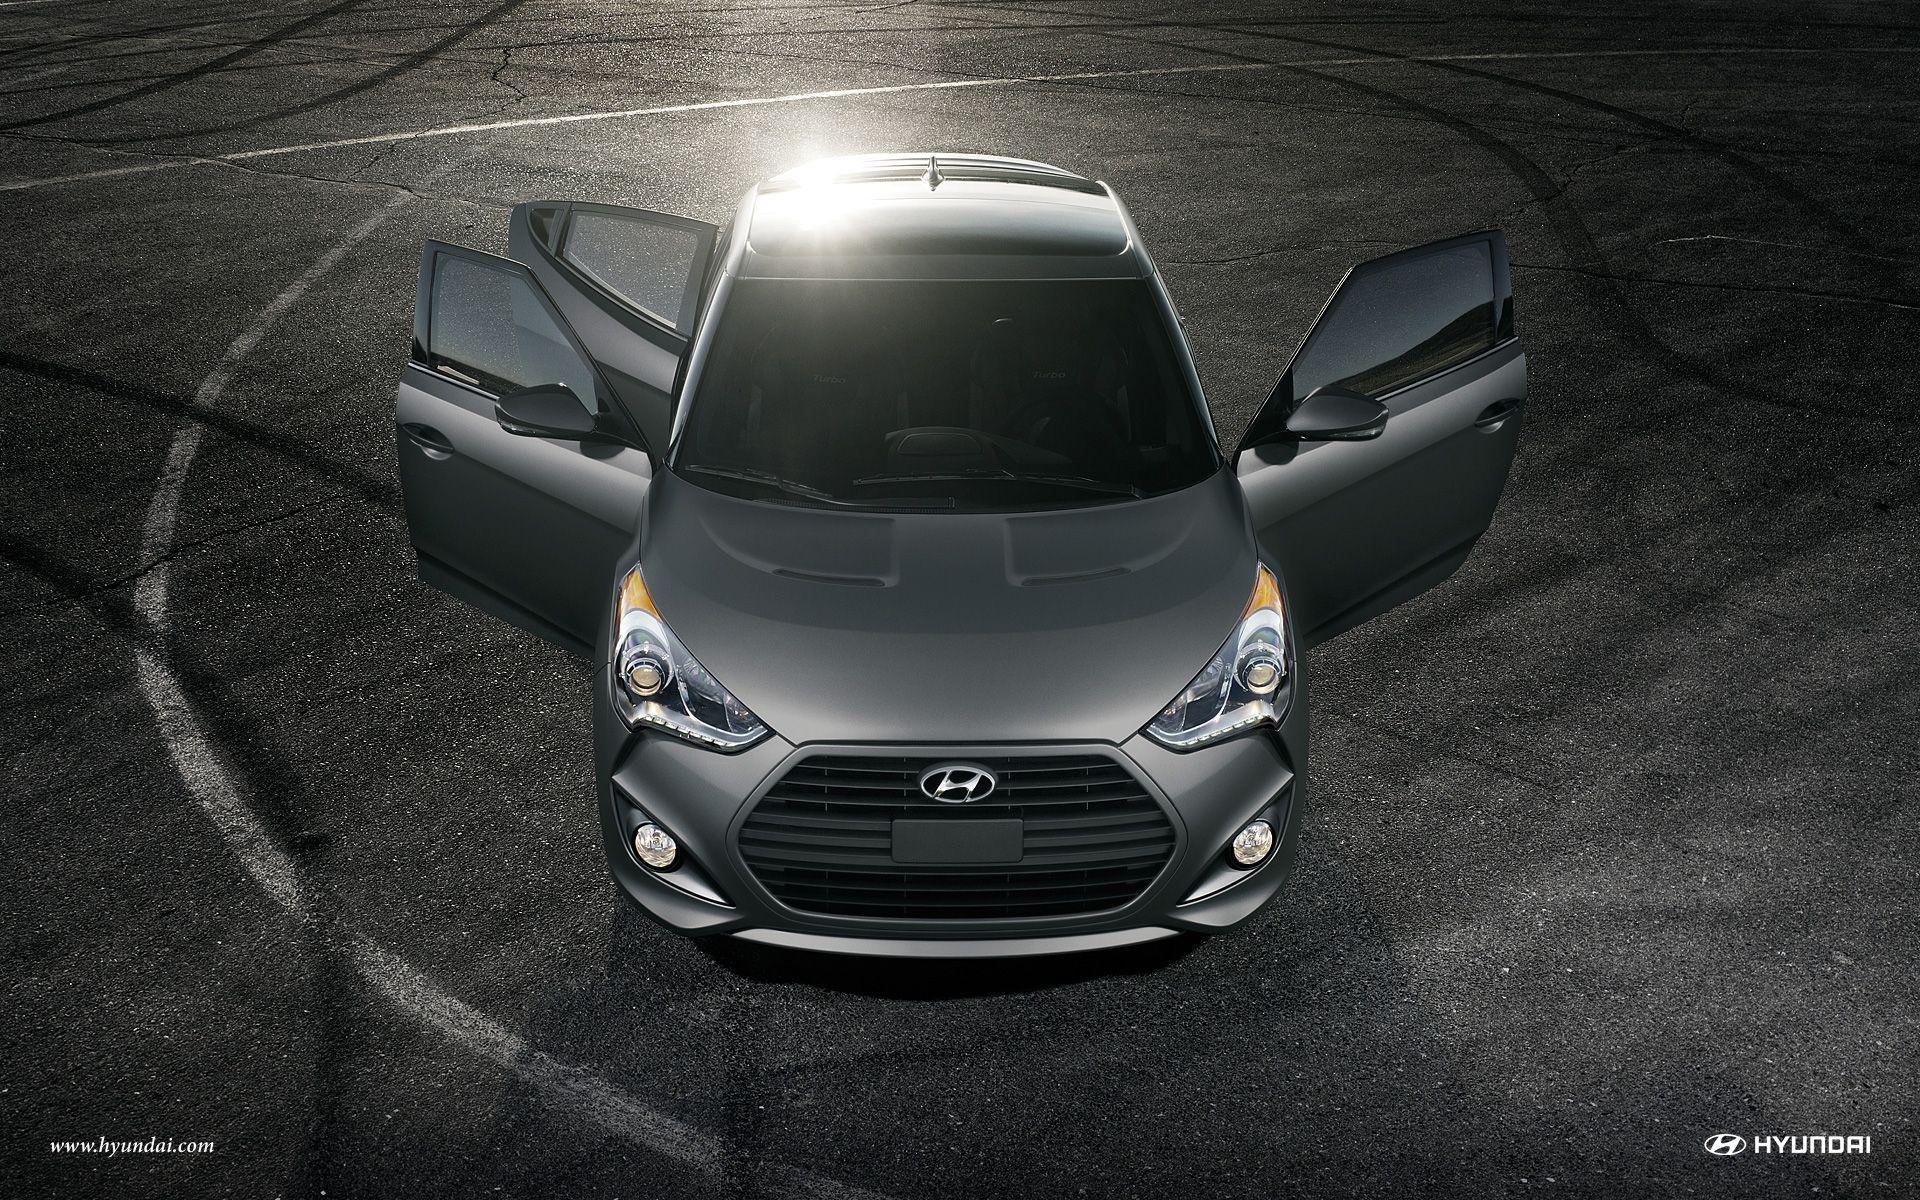 17 Best Hyundai Compacts Ideas Hyundai Hyundai Cars Hyundai Elantra